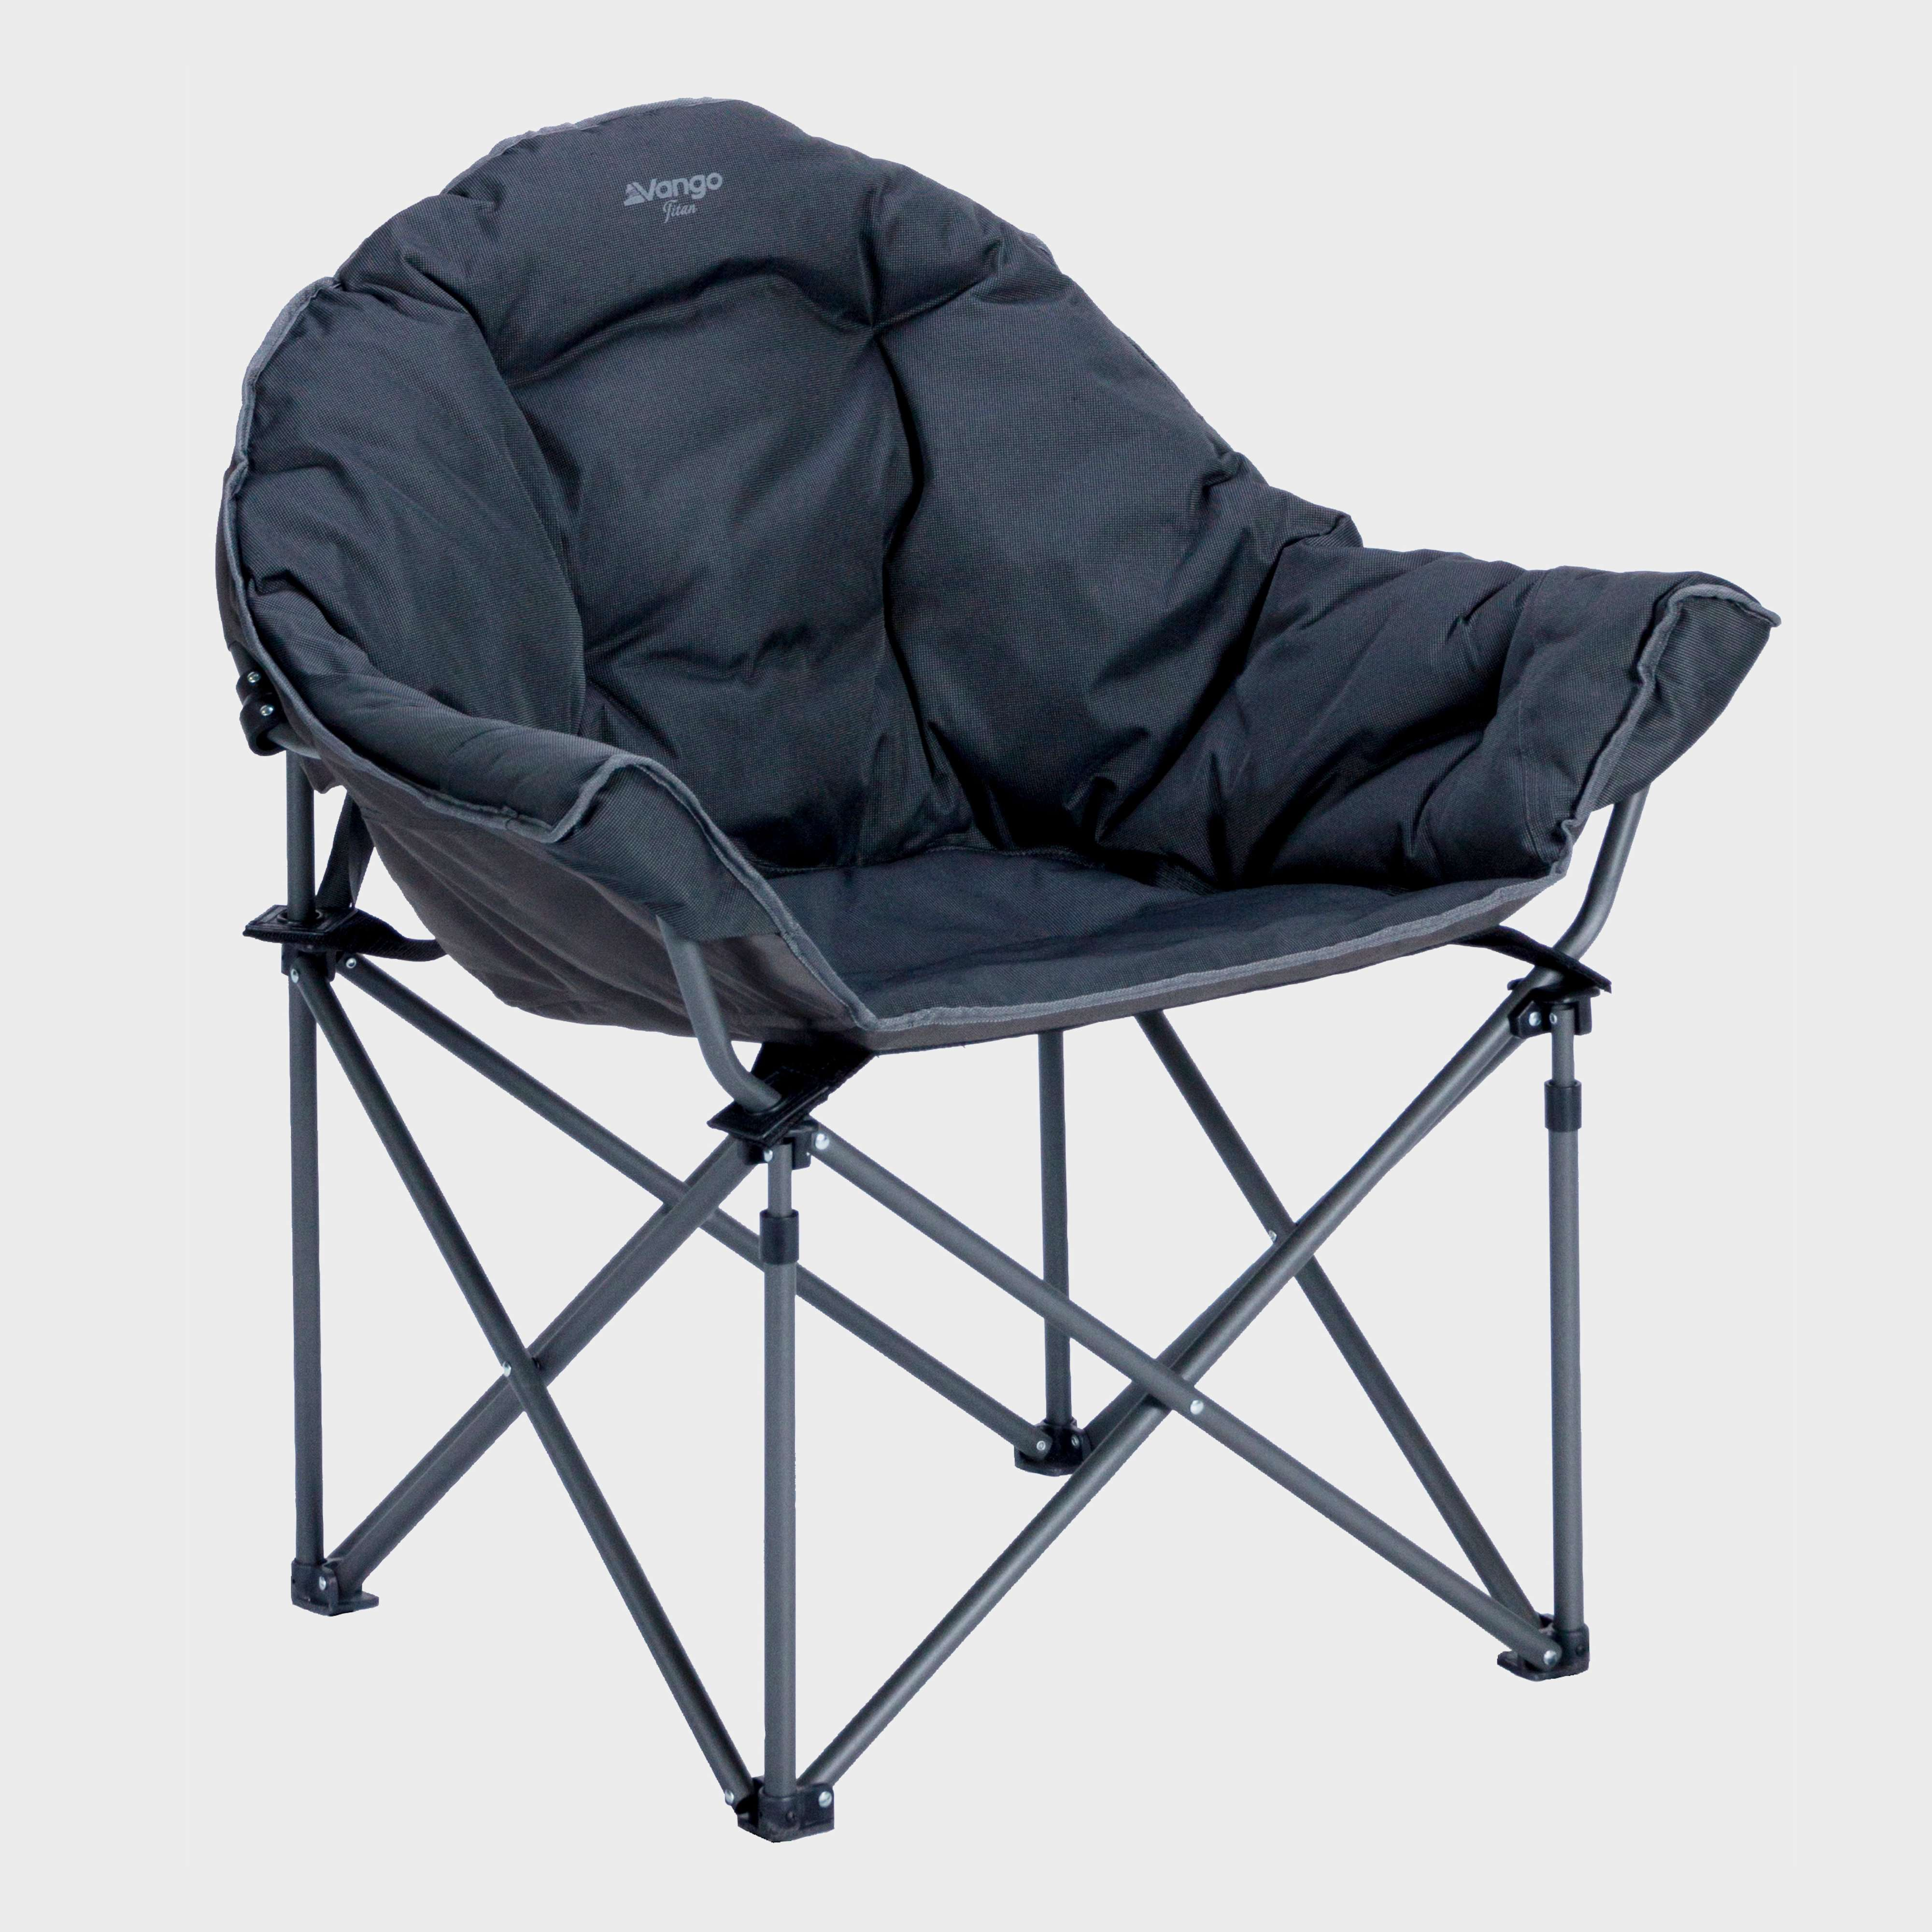 VANGO Titan Chair